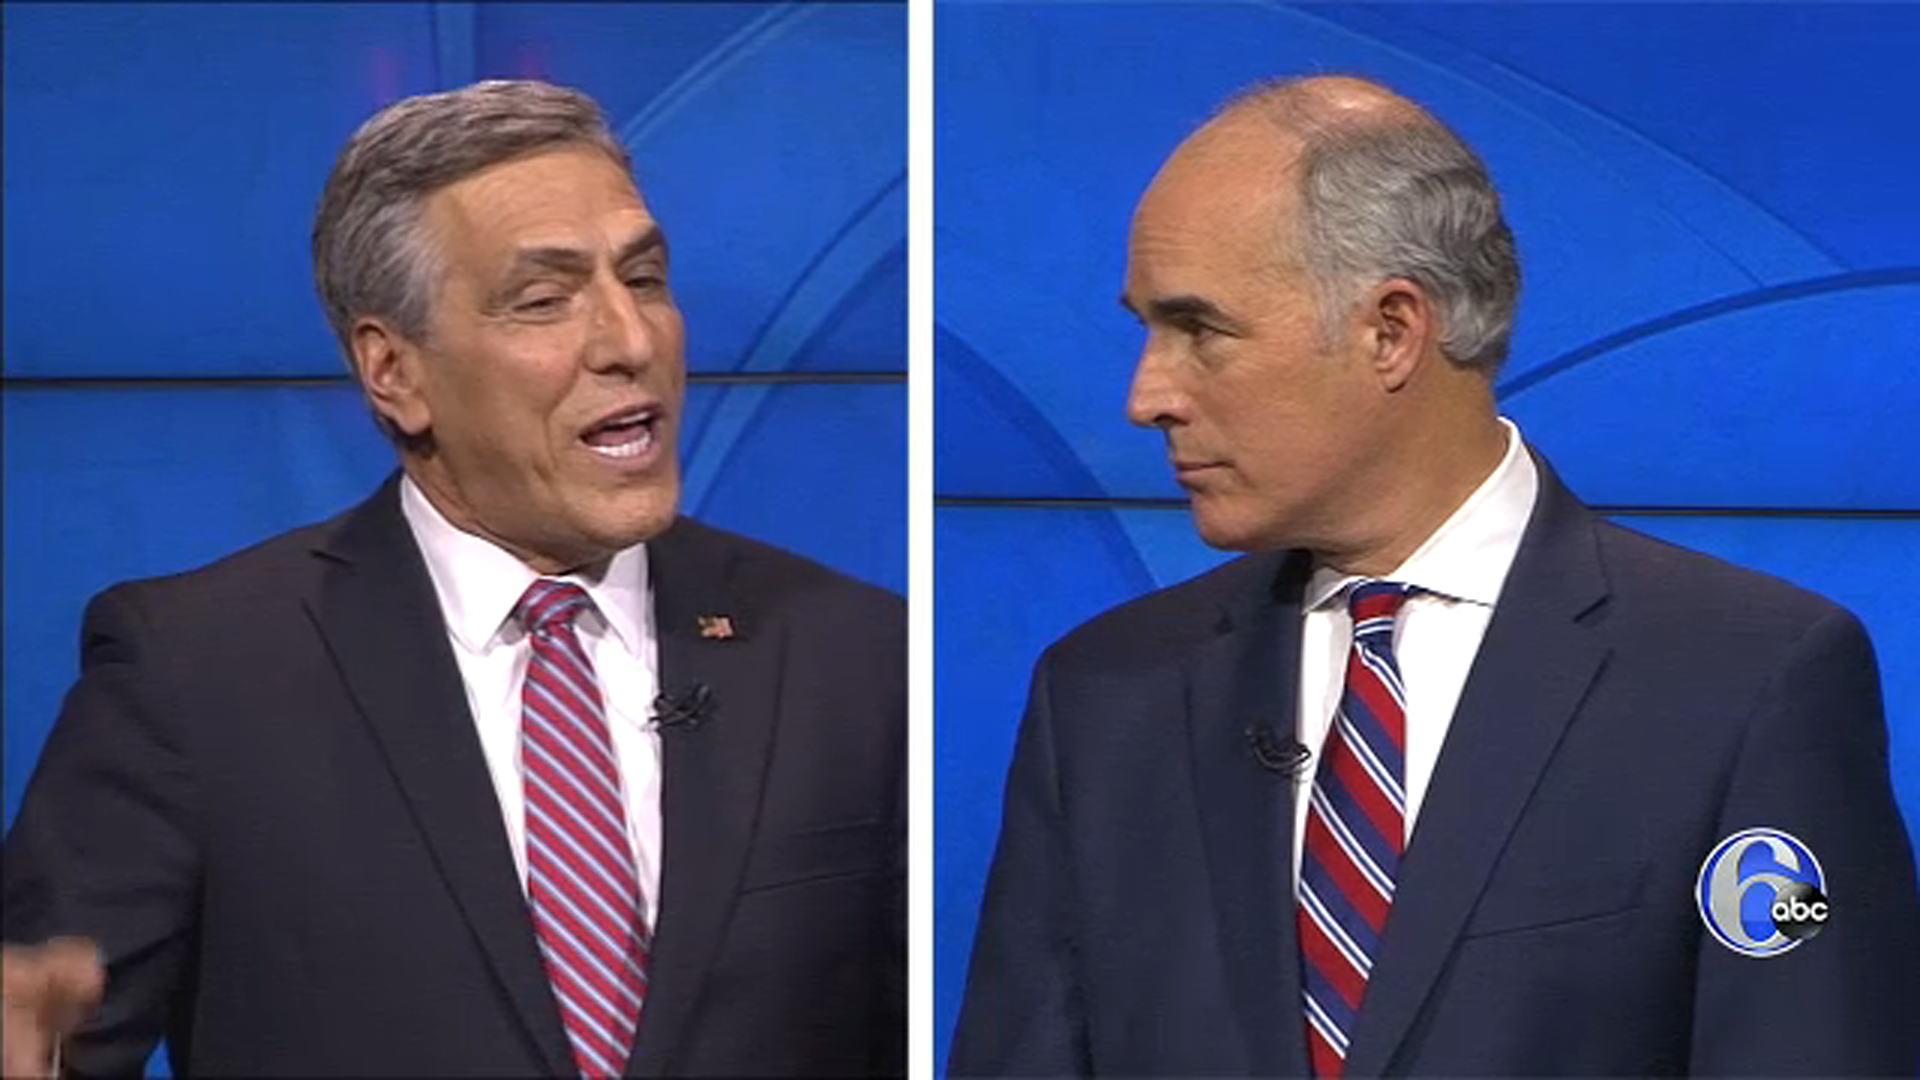 Watch The Pa Senate Debate Between Bob Casey And Lou Barletta 6abc Com